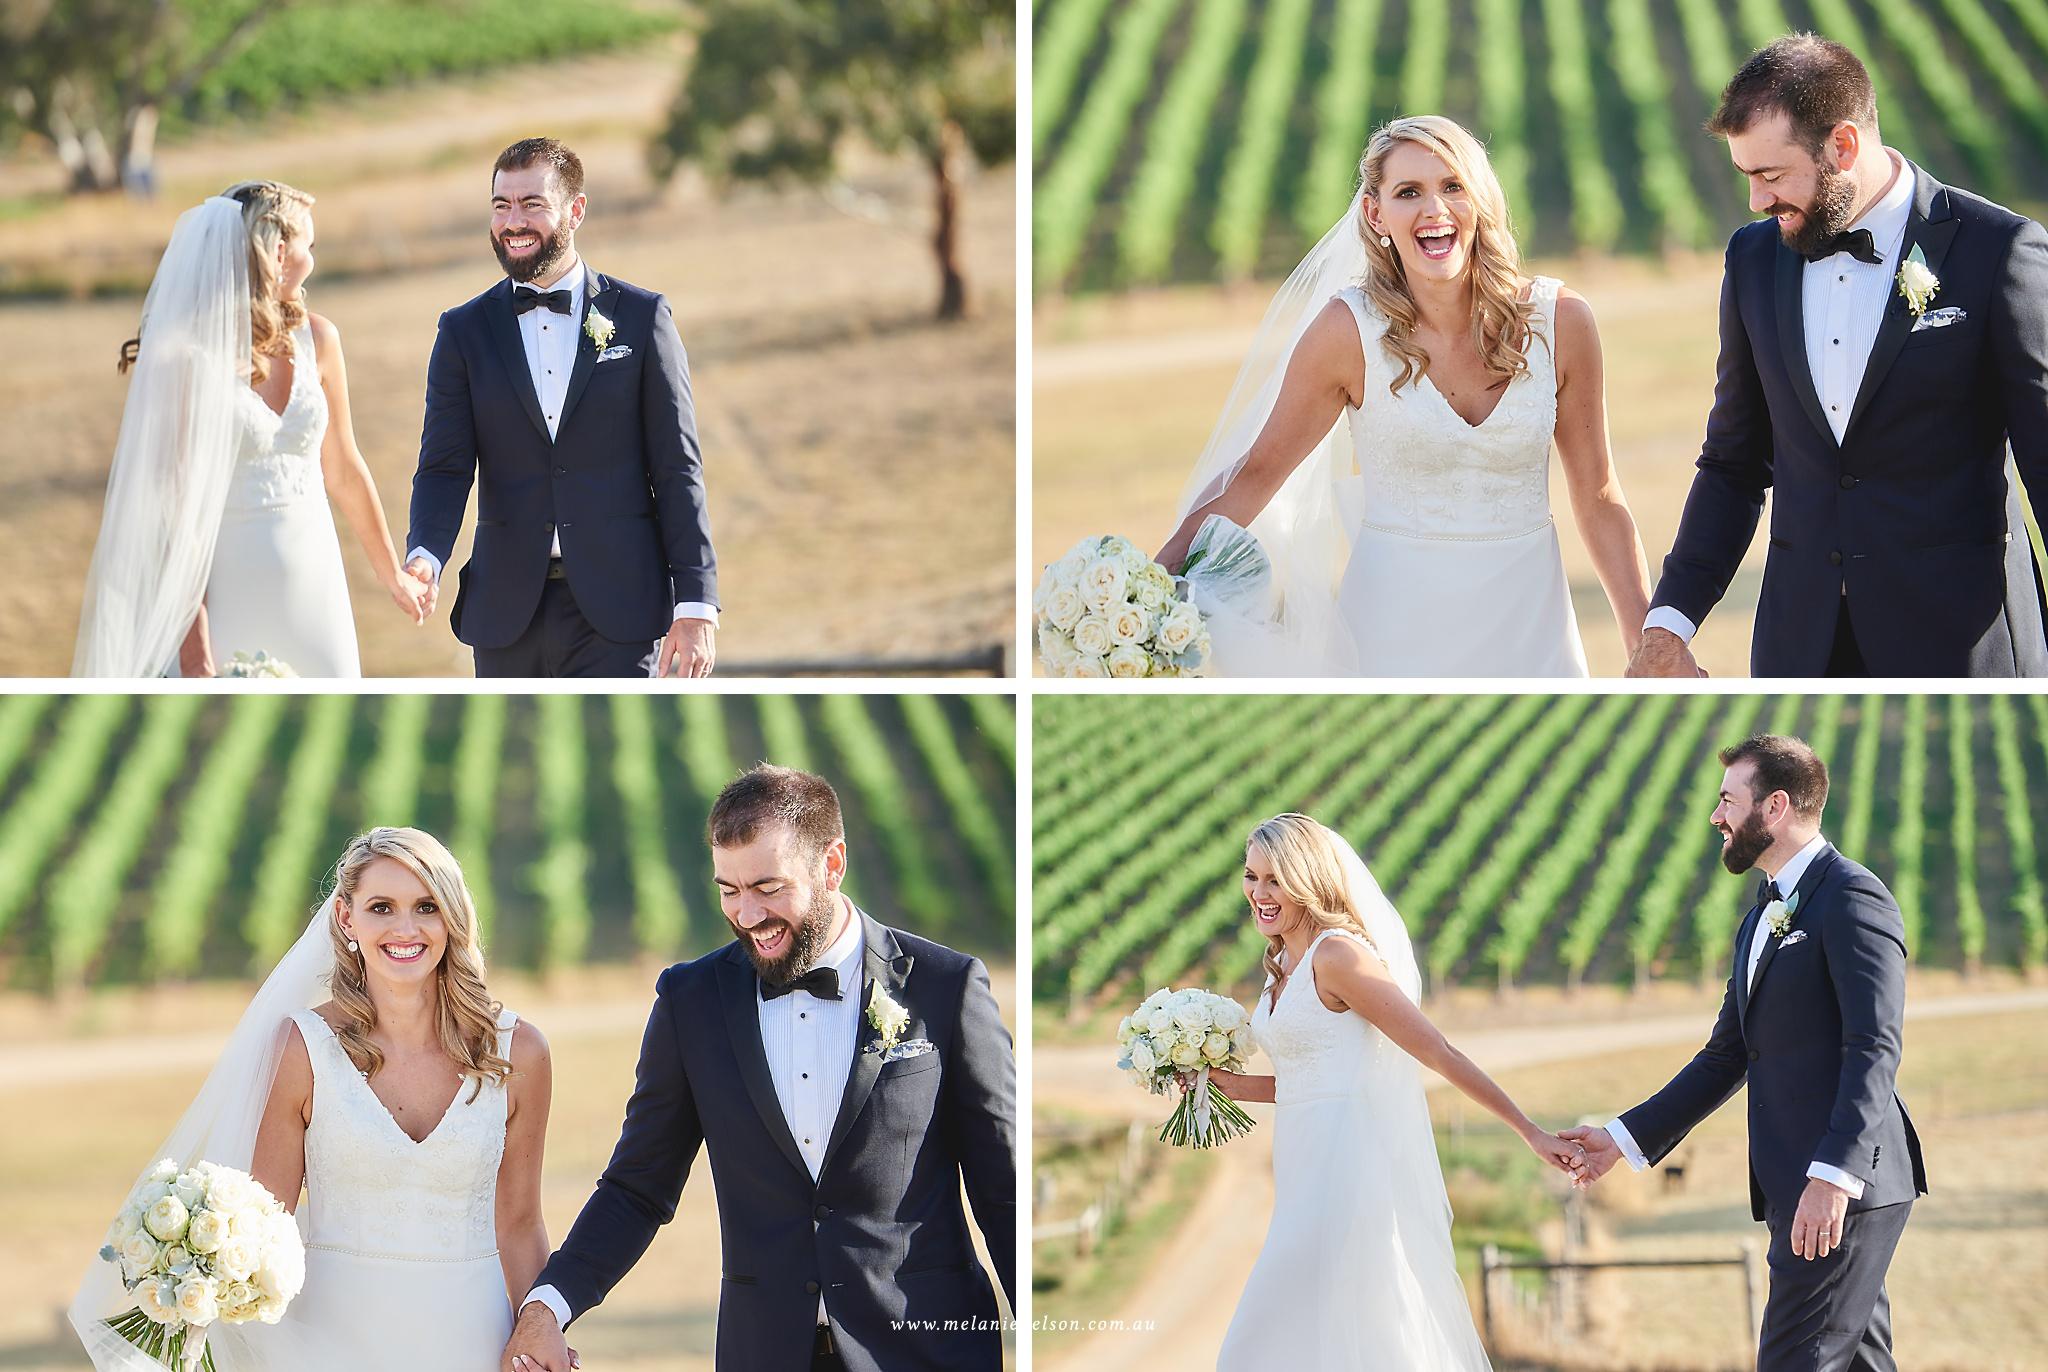 longview_vineyard_wedding_0057.jpg